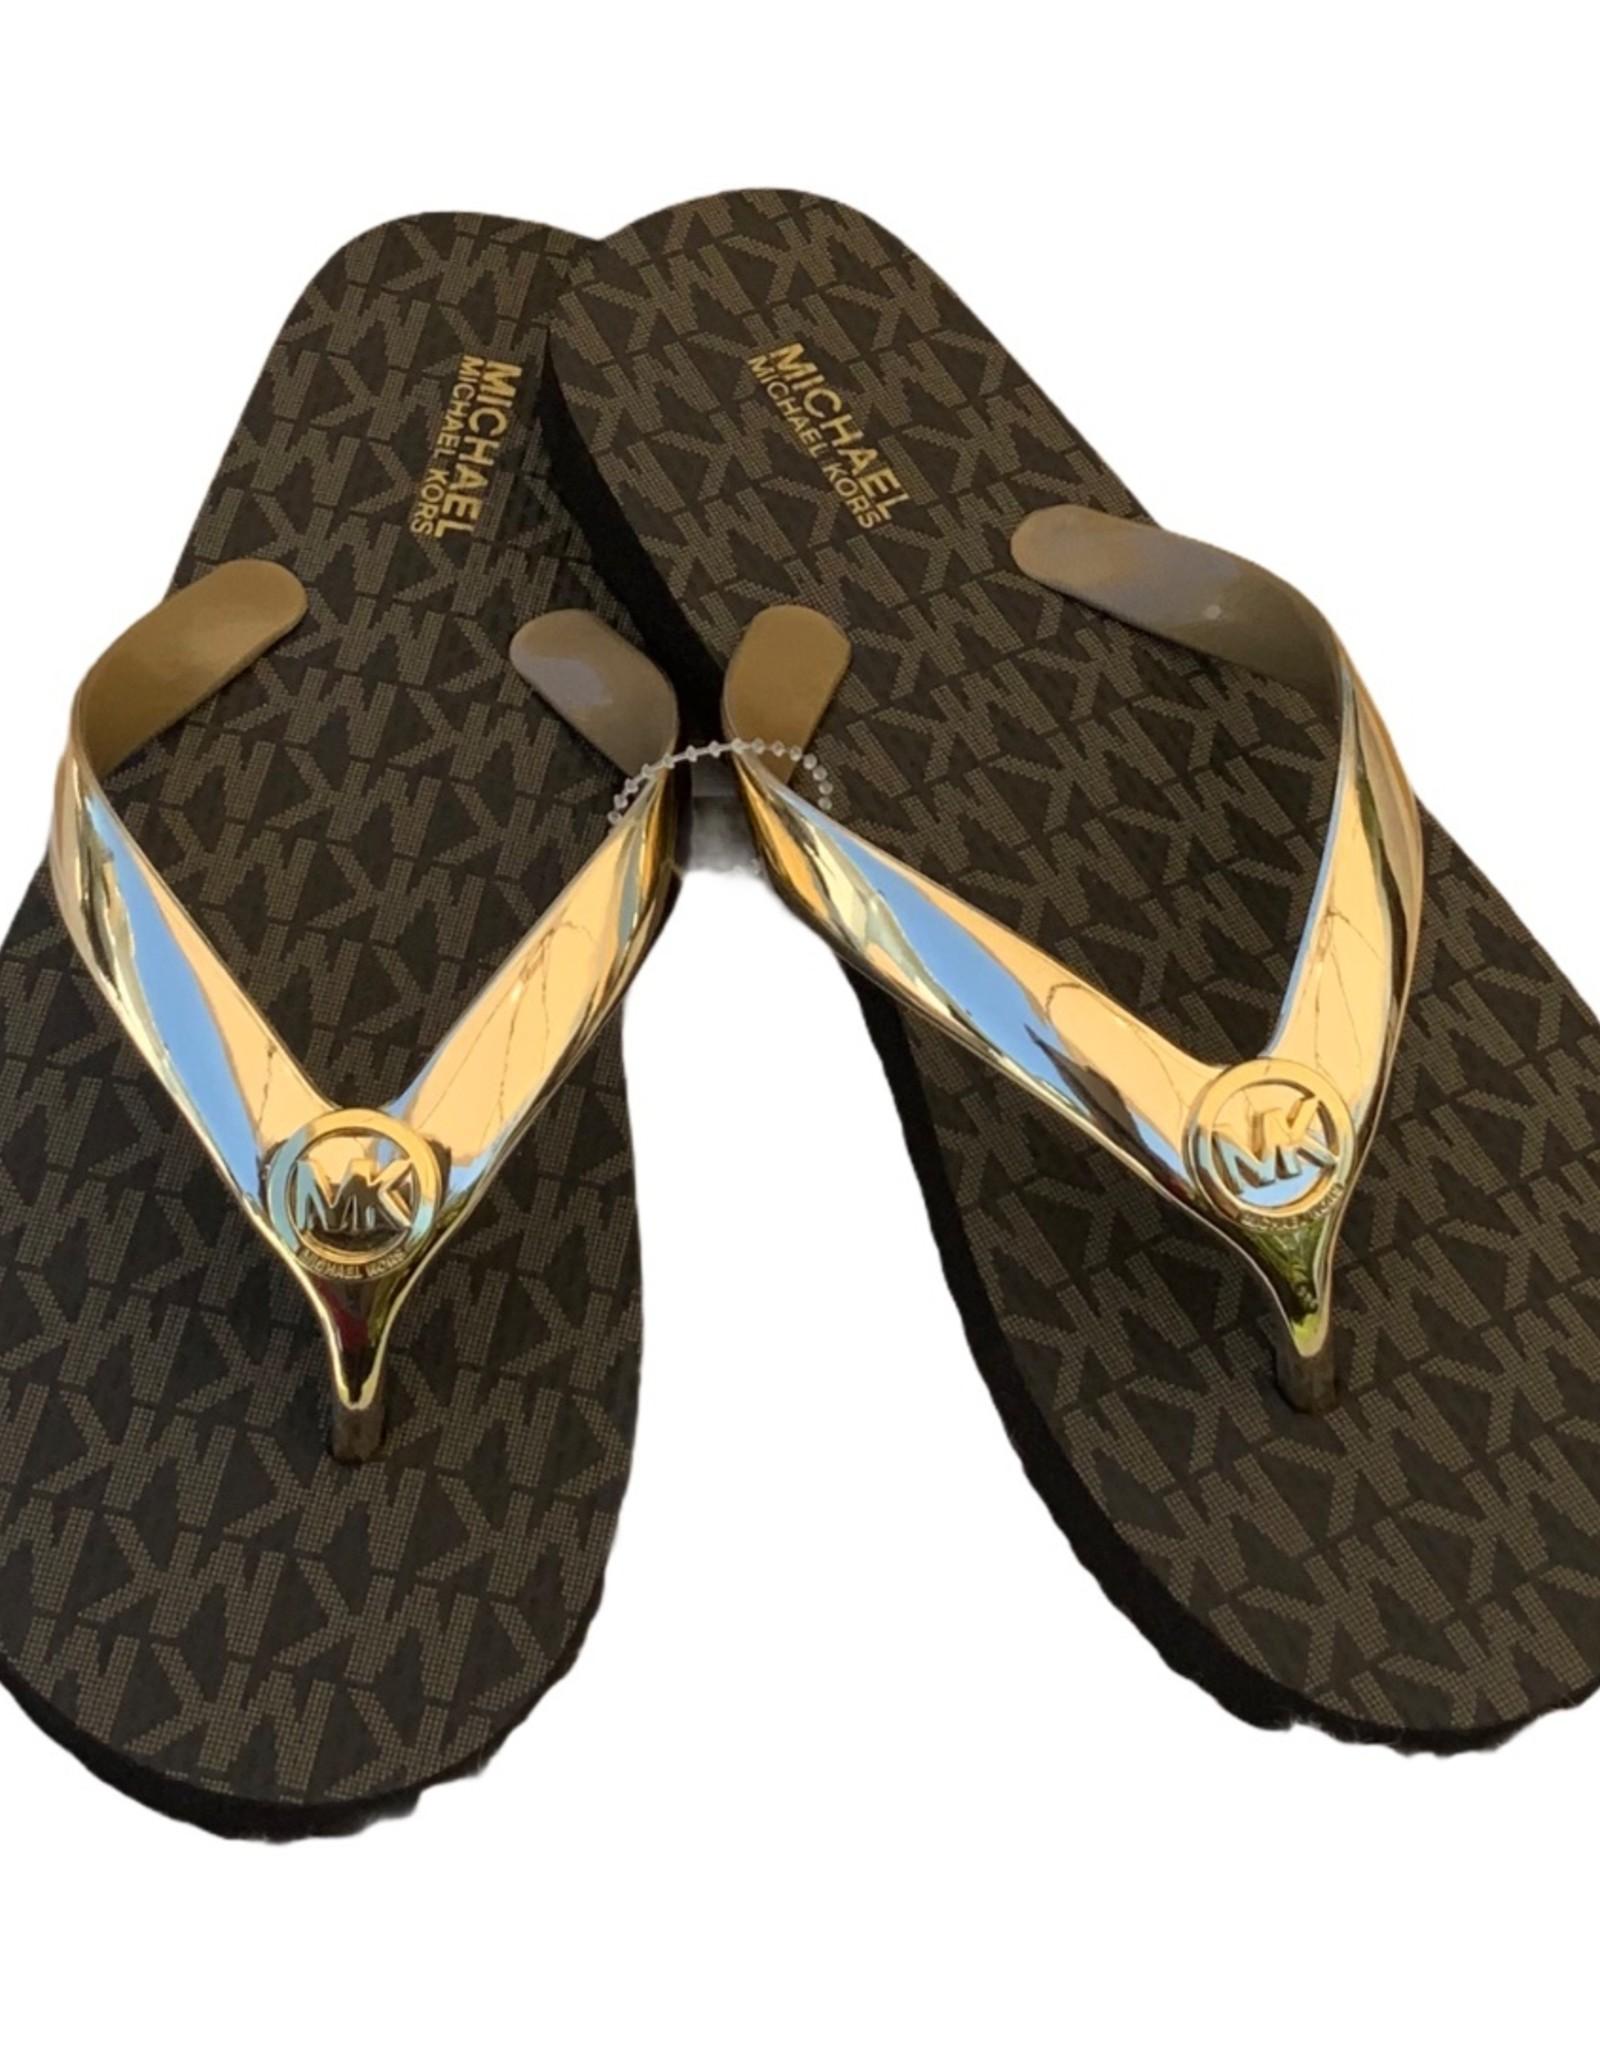 Michael Kors Michael Kors Flip-flops  Metallic PVC